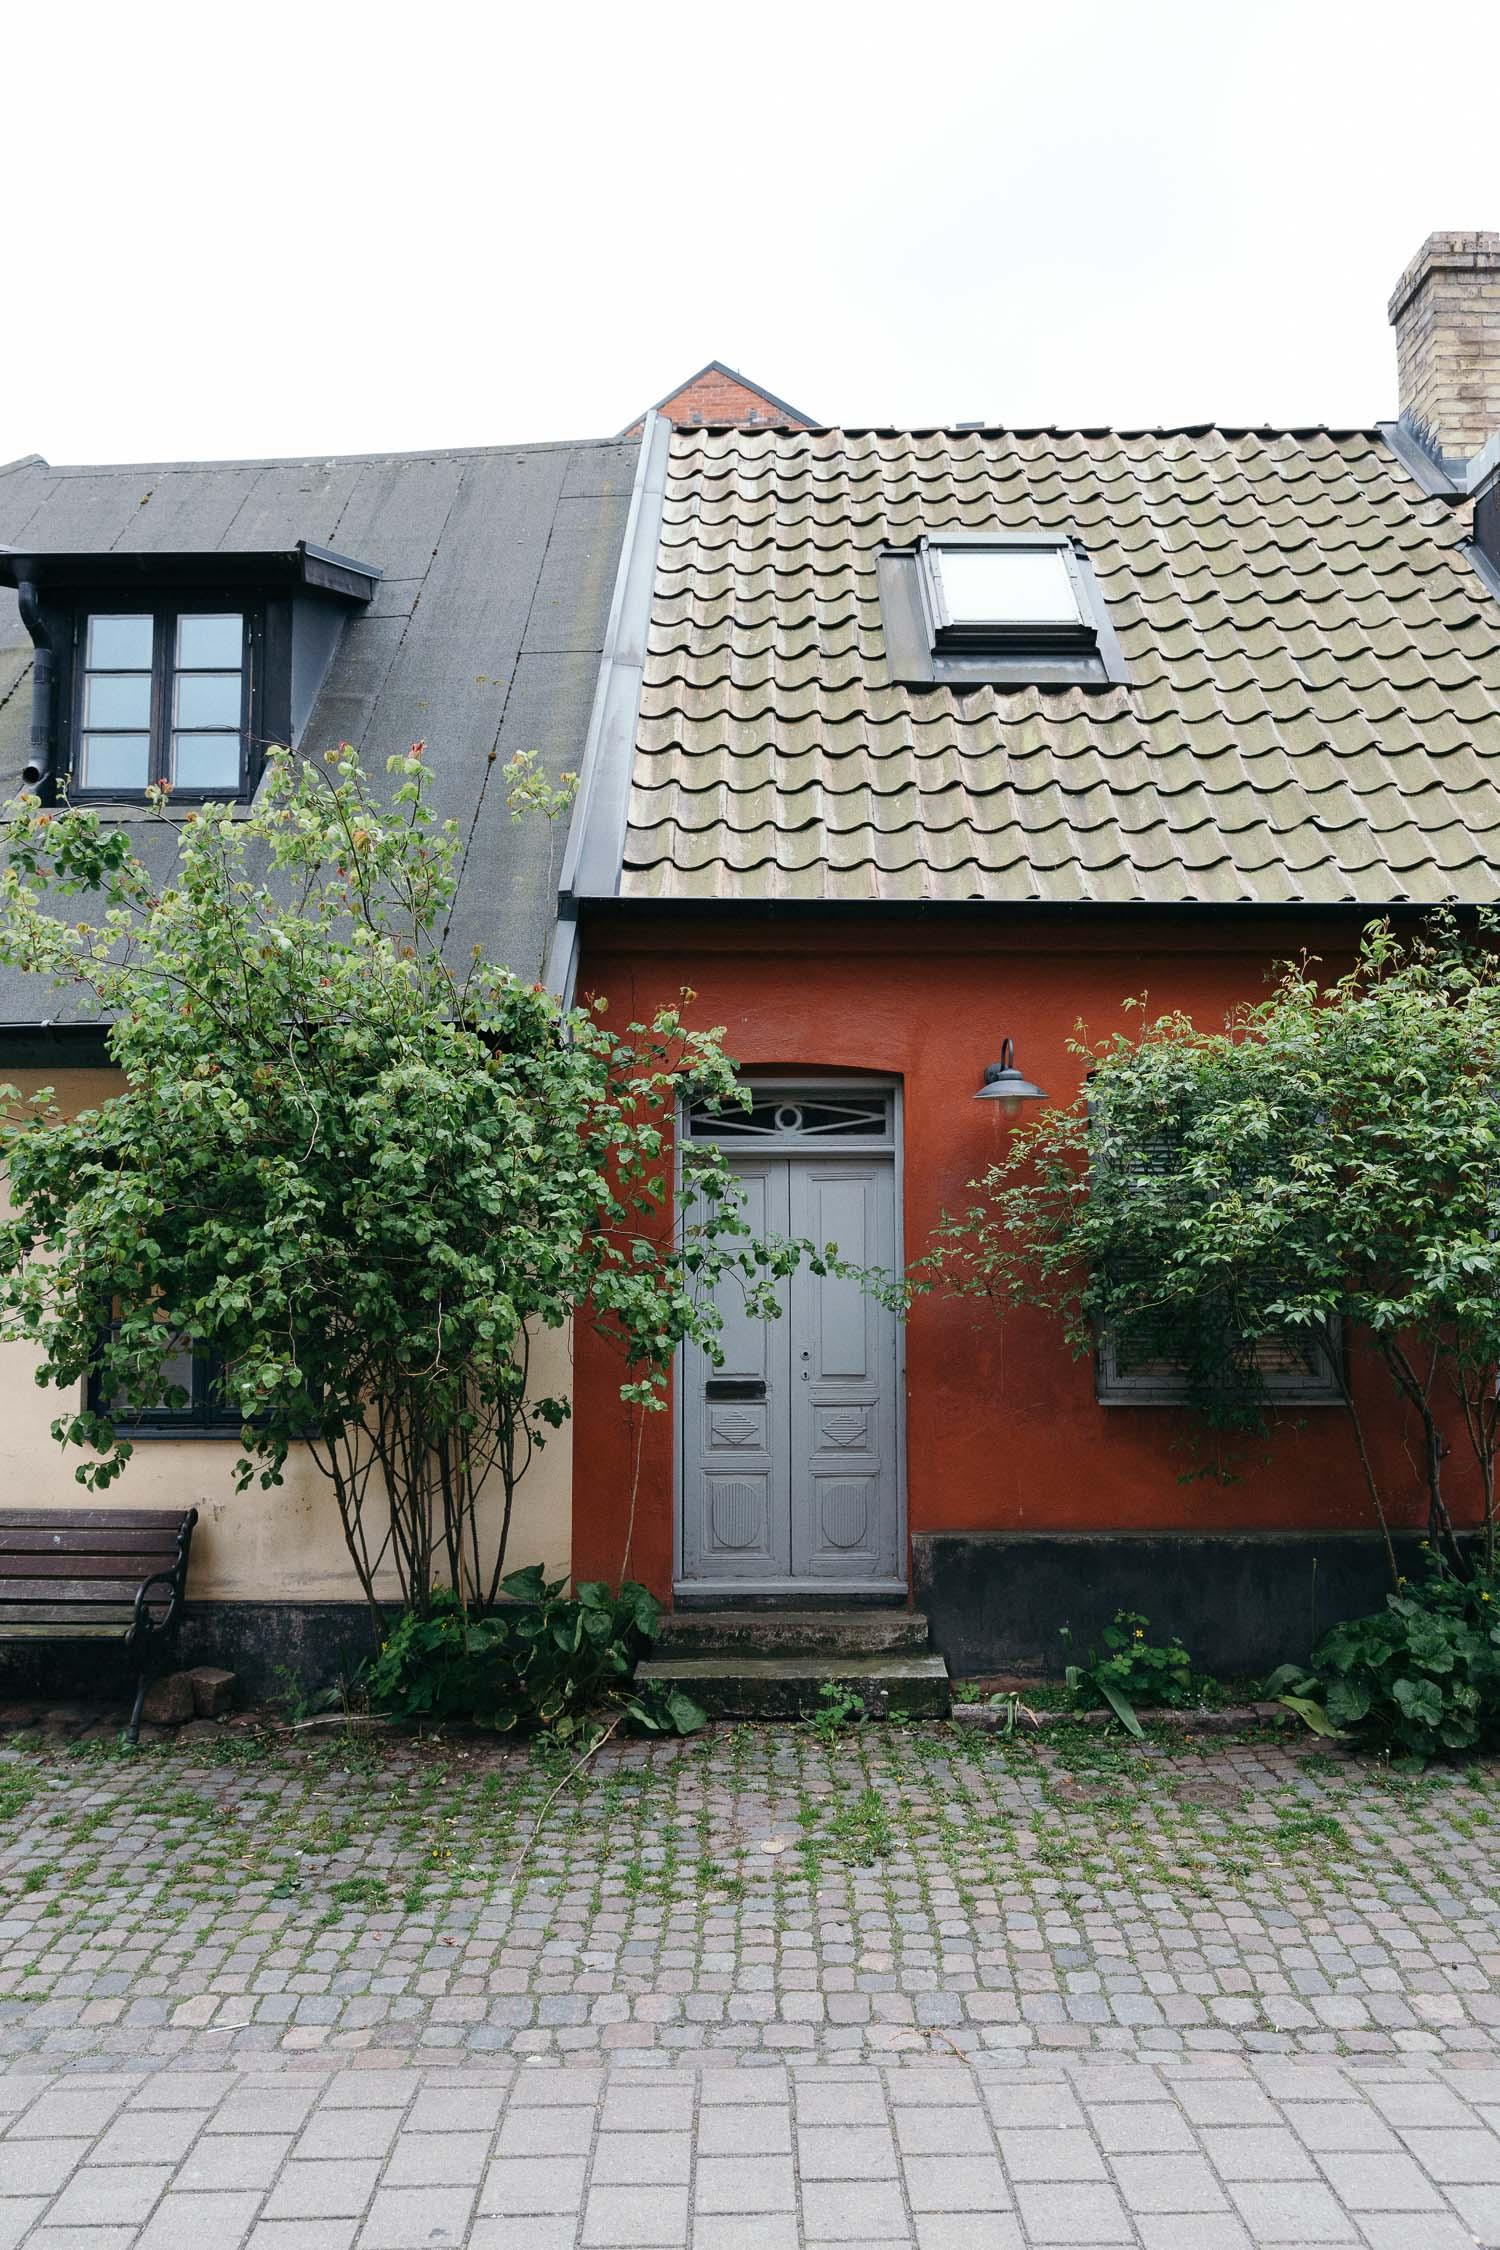 Visti Skane Sweden - by On a hazy morning Amsterdam